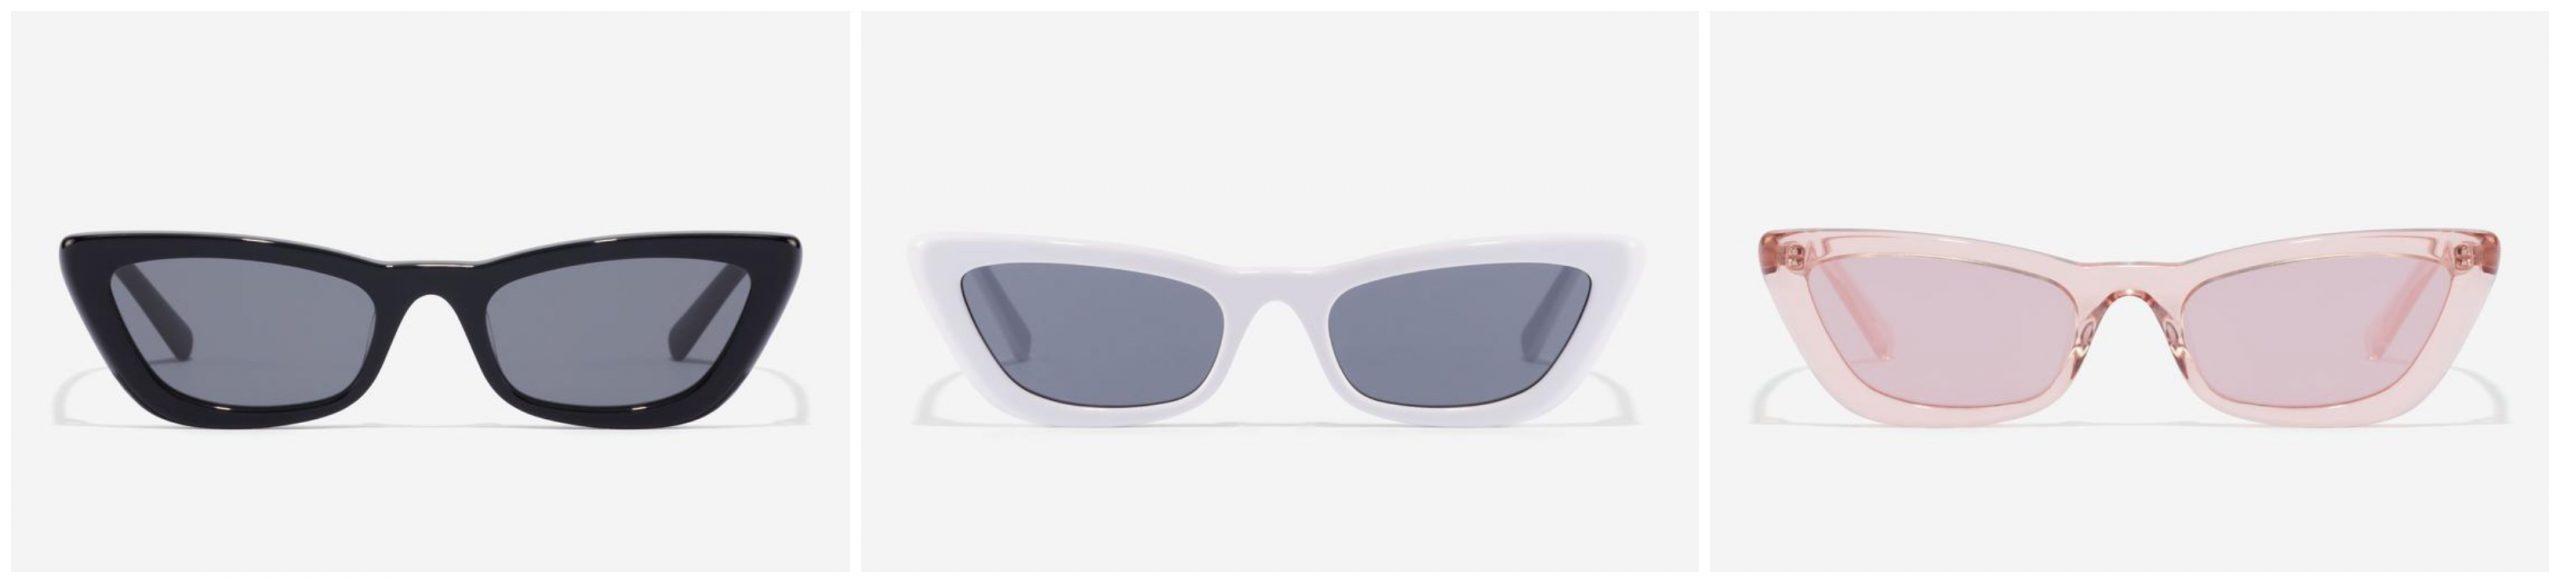 Gafas estilo cat eye